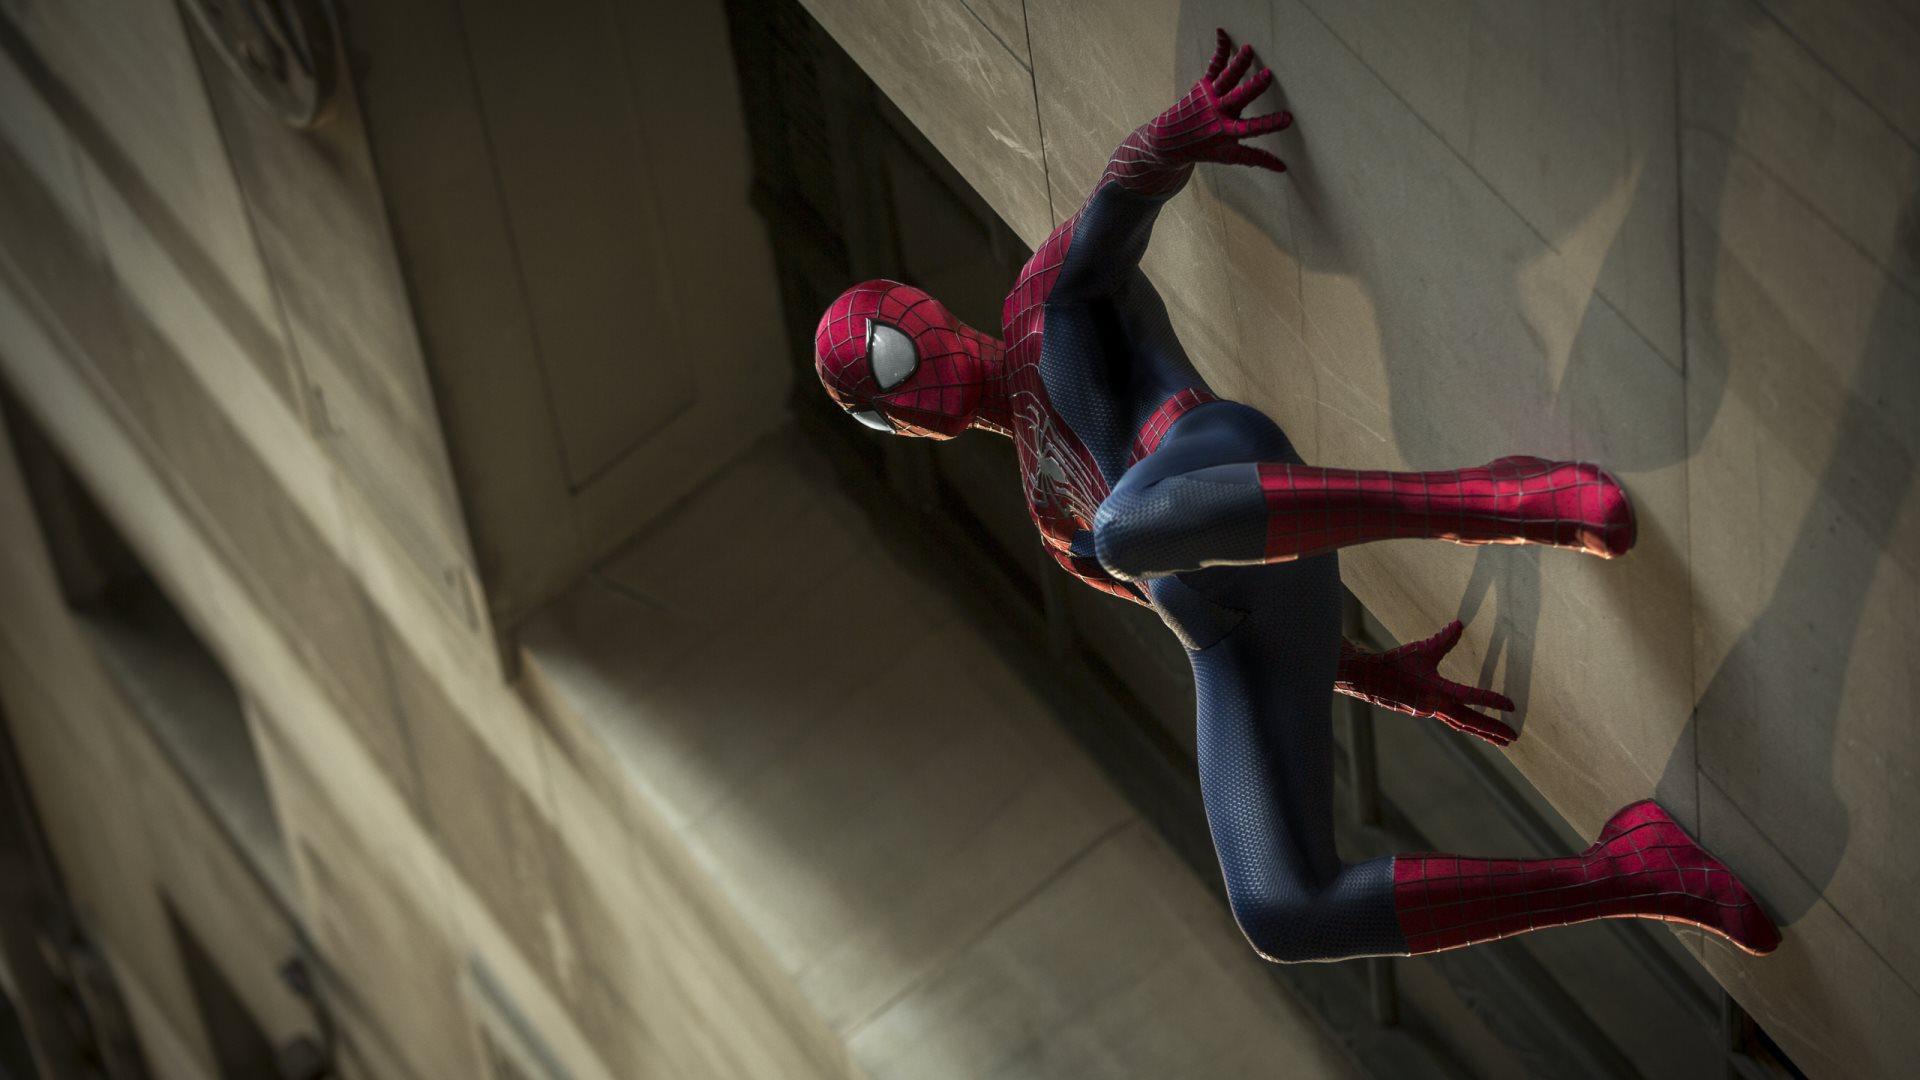 Amazing Spider Man 3d Live Wallpaper Free Download The Amazing Spider Man 2 Wallpaper Hd